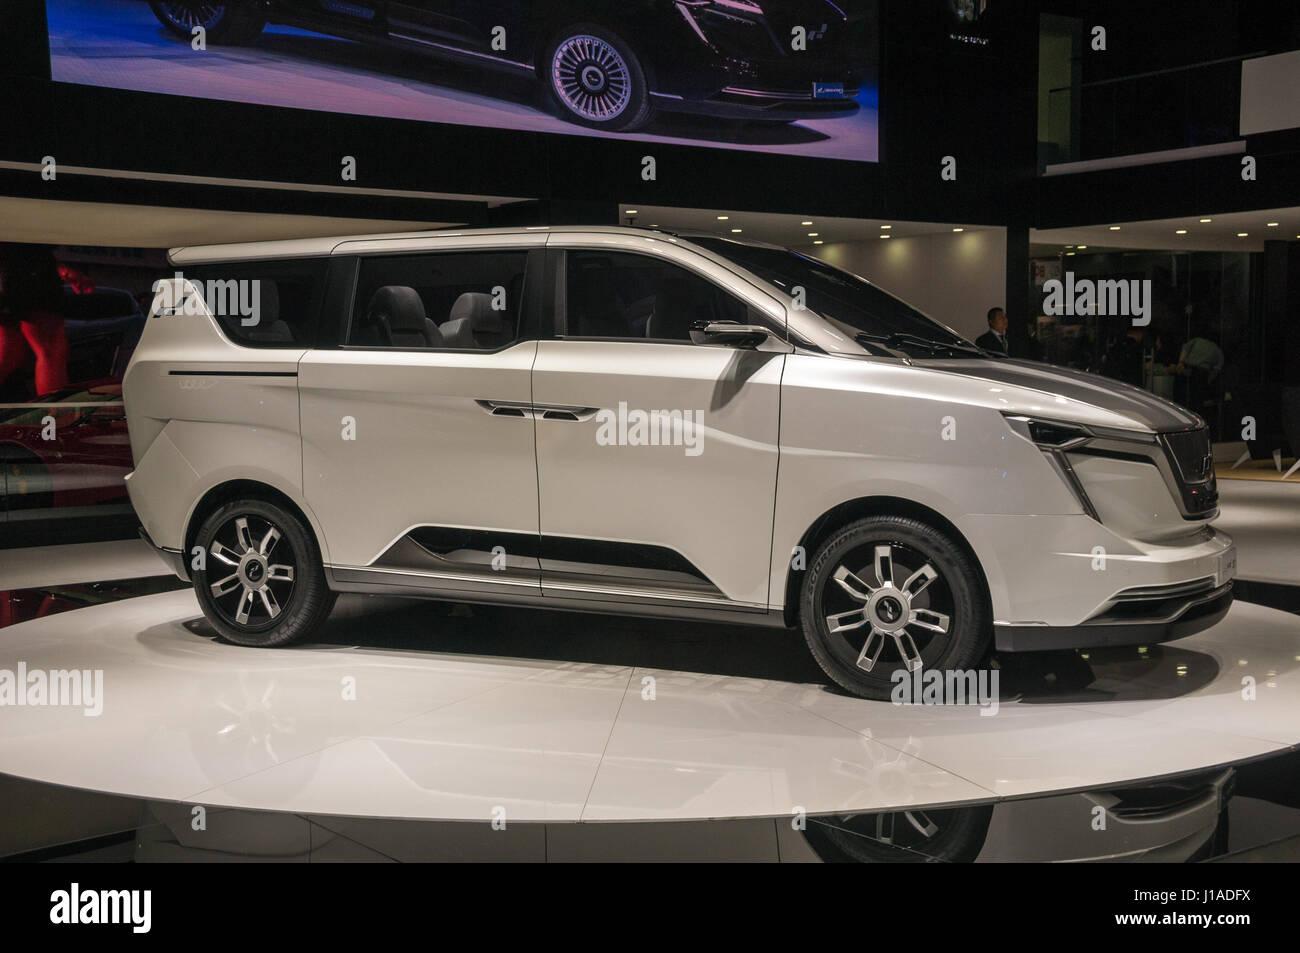 Shanghai, China  19th April, 2017  W Motors Iconiq 7 MPV electric